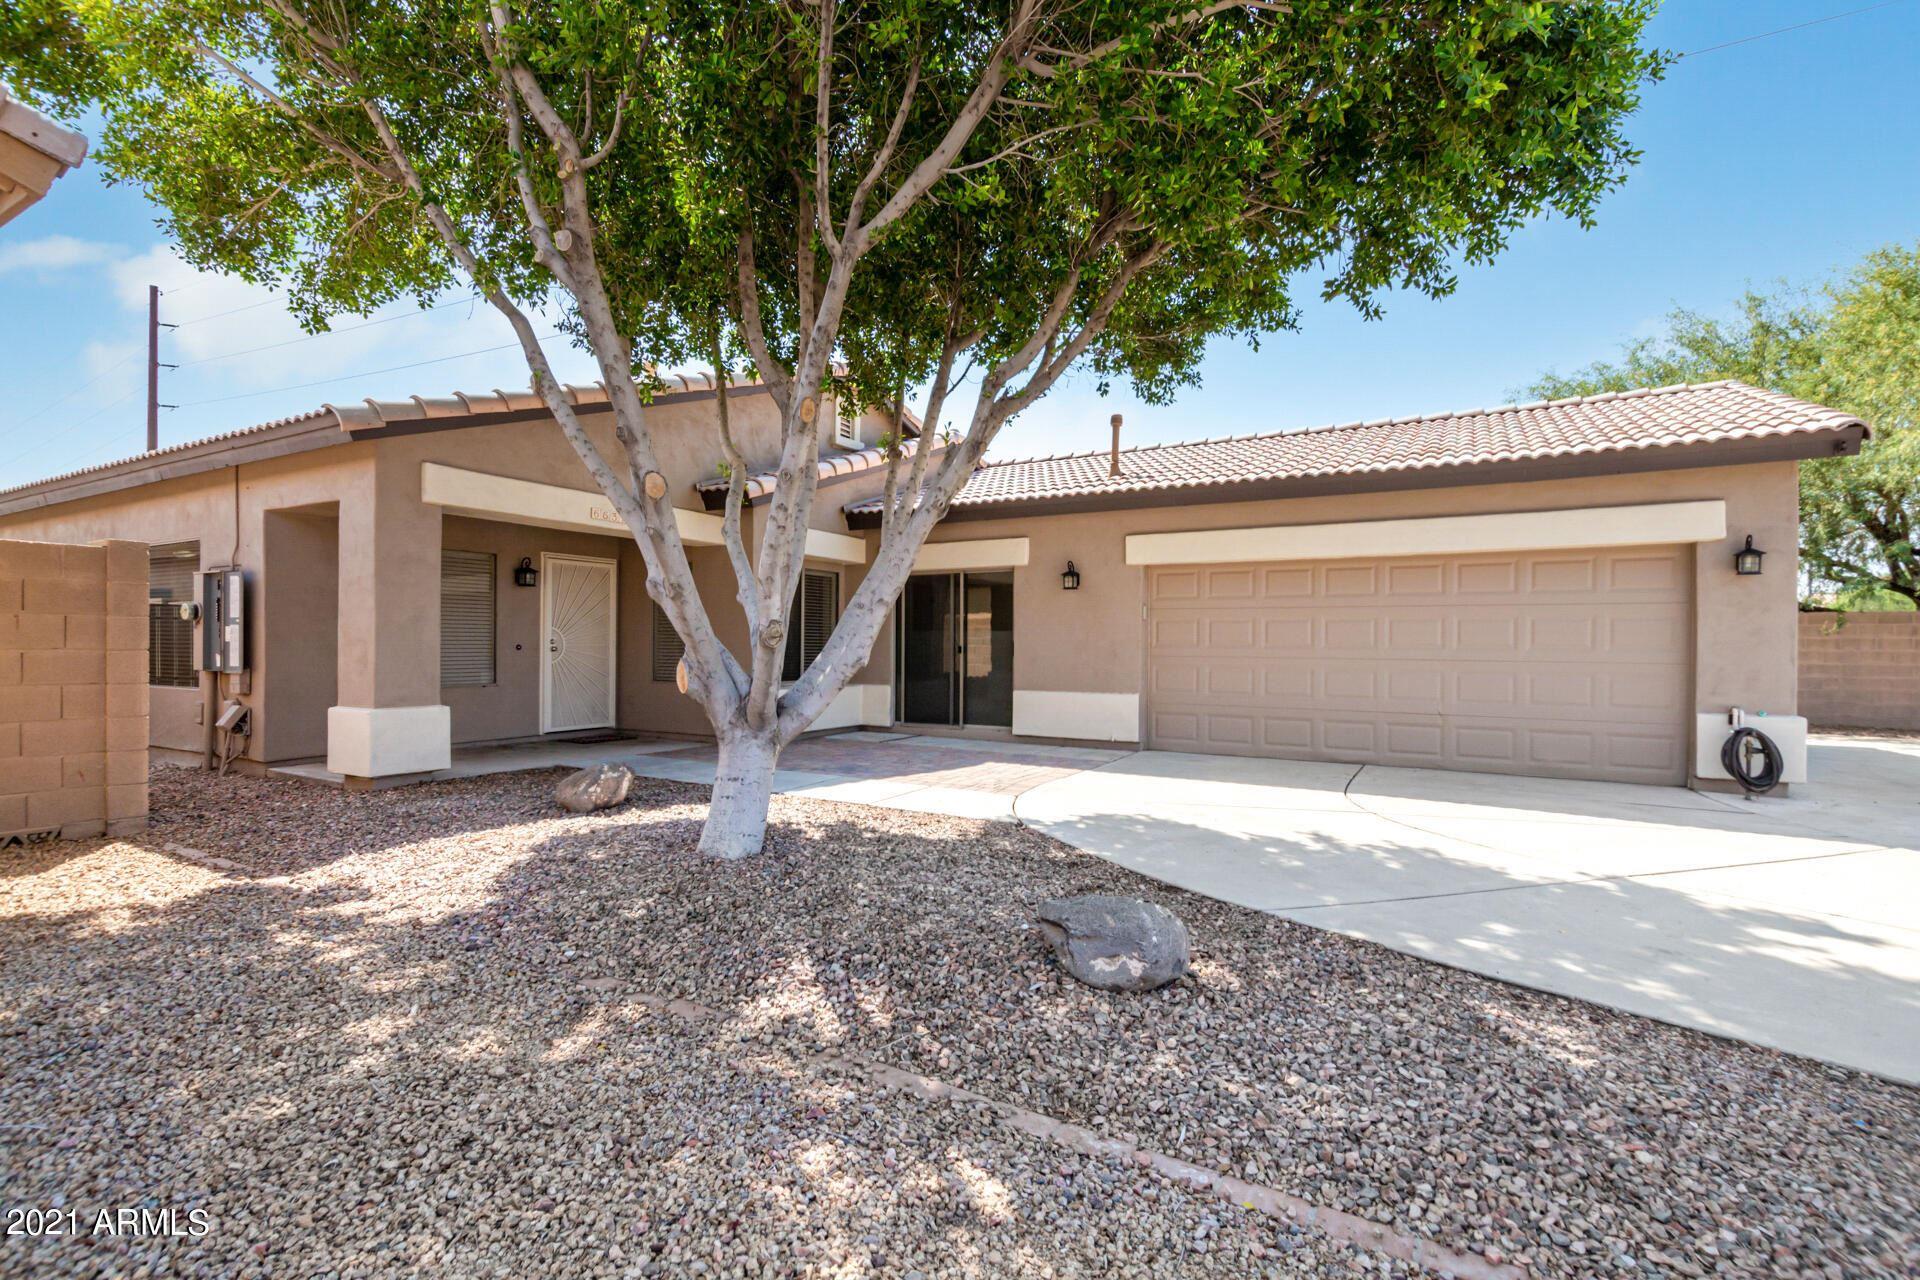 6637 W HONEYSUCKLE Drive, Phoenix, AZ 85083 - MLS#: 6294880